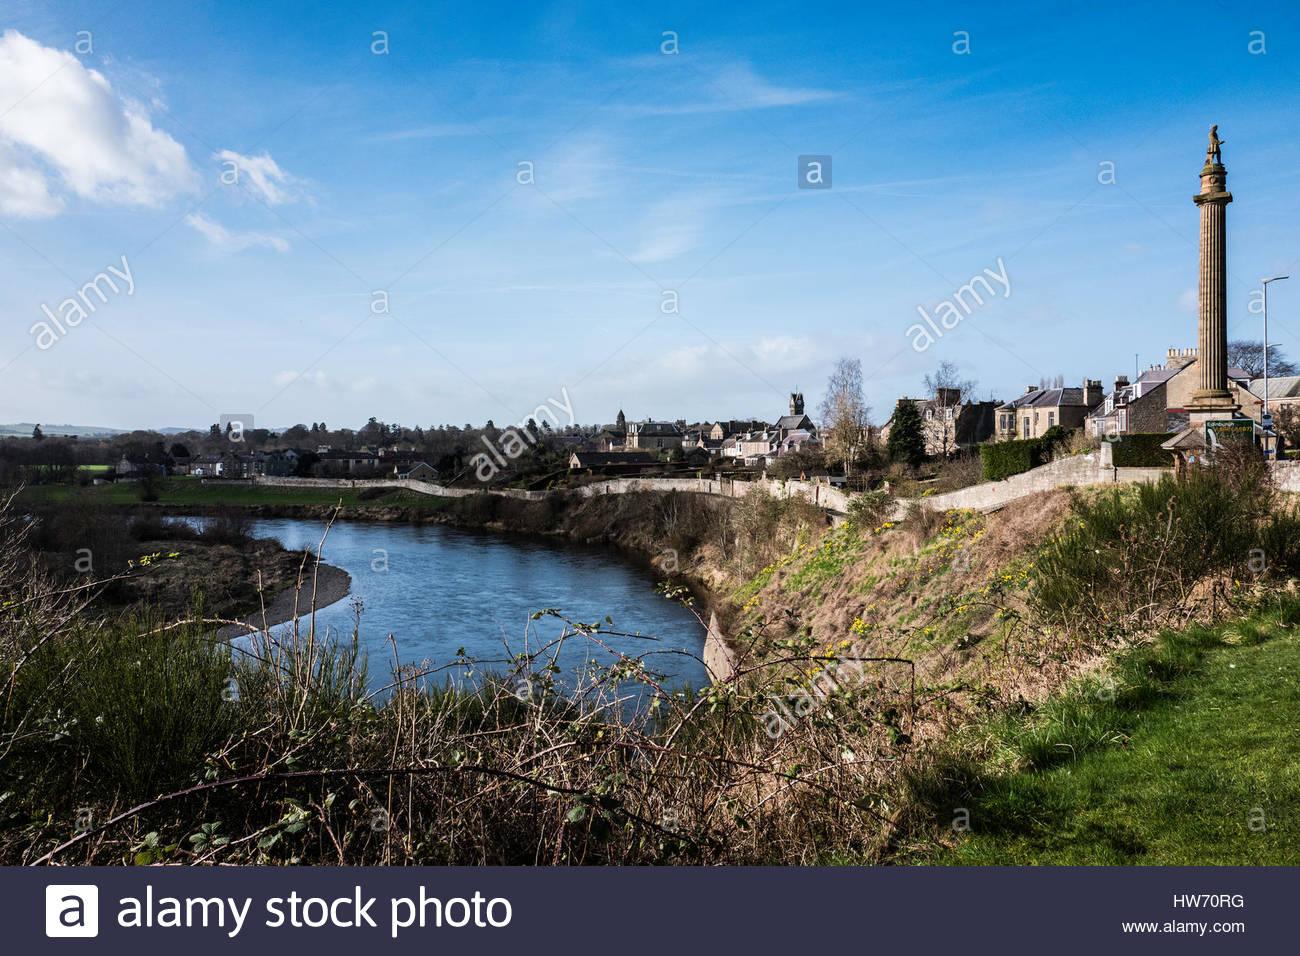 River Tweed, Coldstream, Scottish Borders, UK. 14th March 2017.  The River Tweed in the town of Coldstream. The - Stock Image